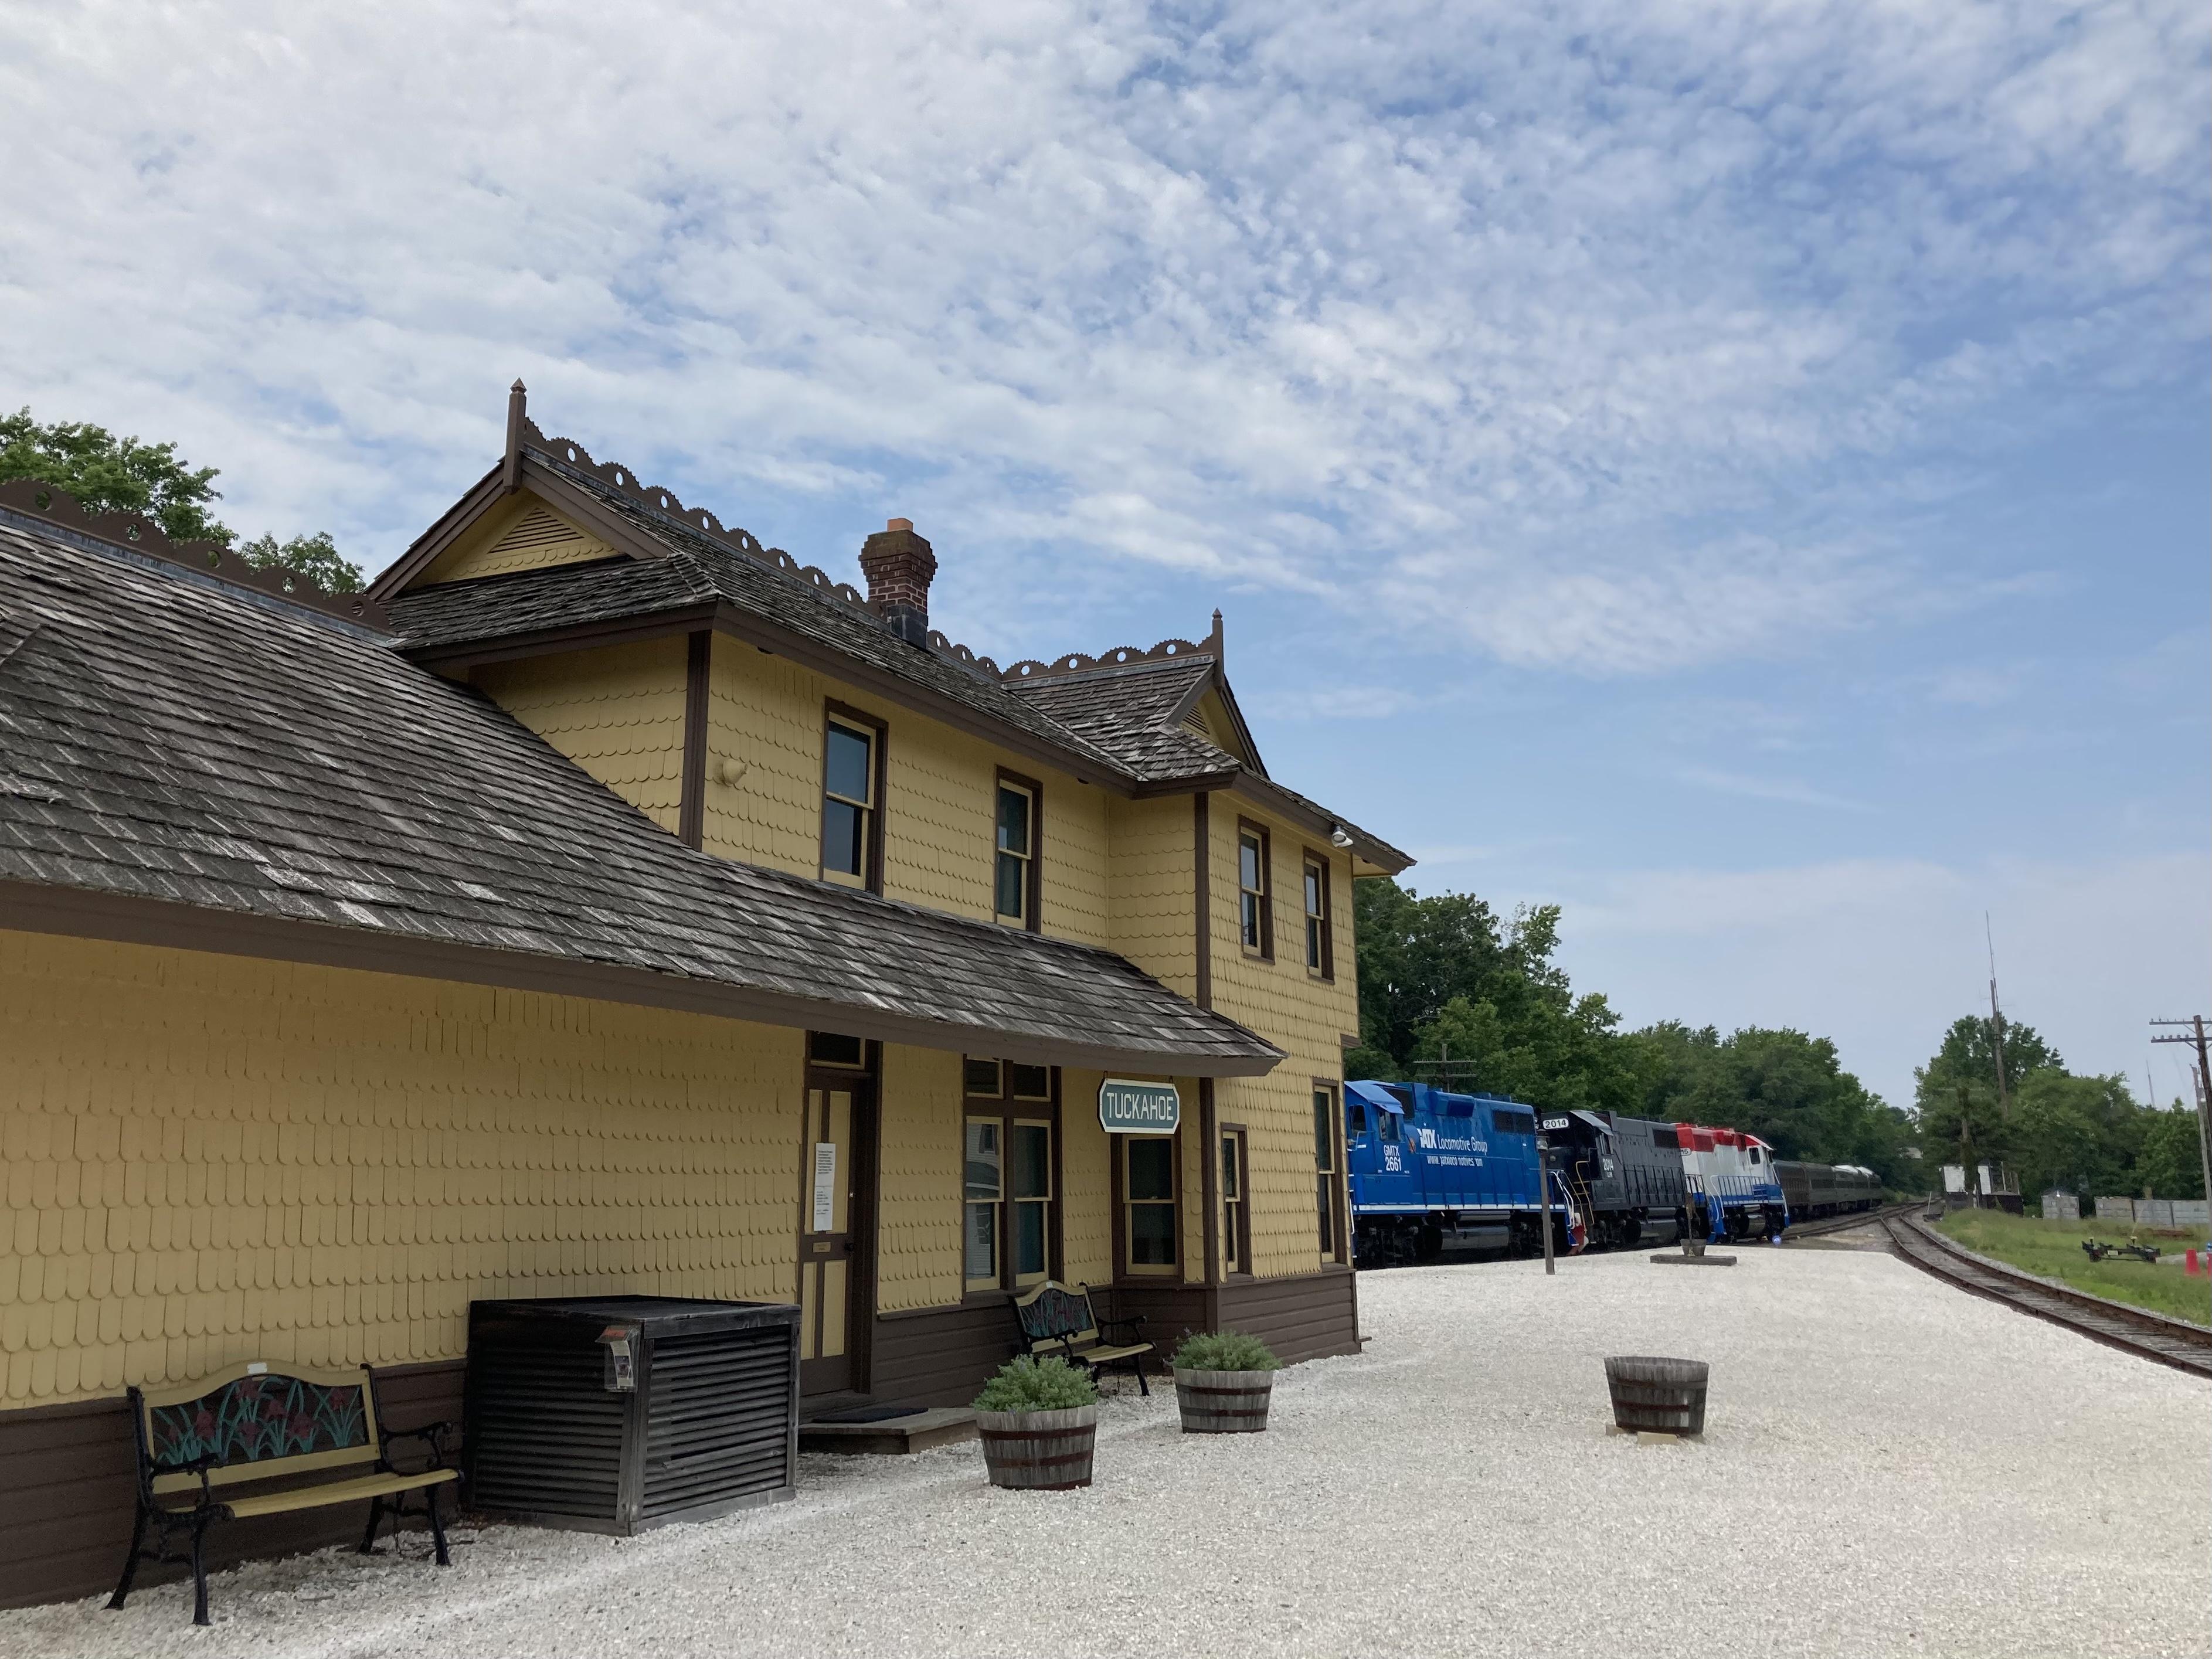 Exterior of Tuckahoe Station.